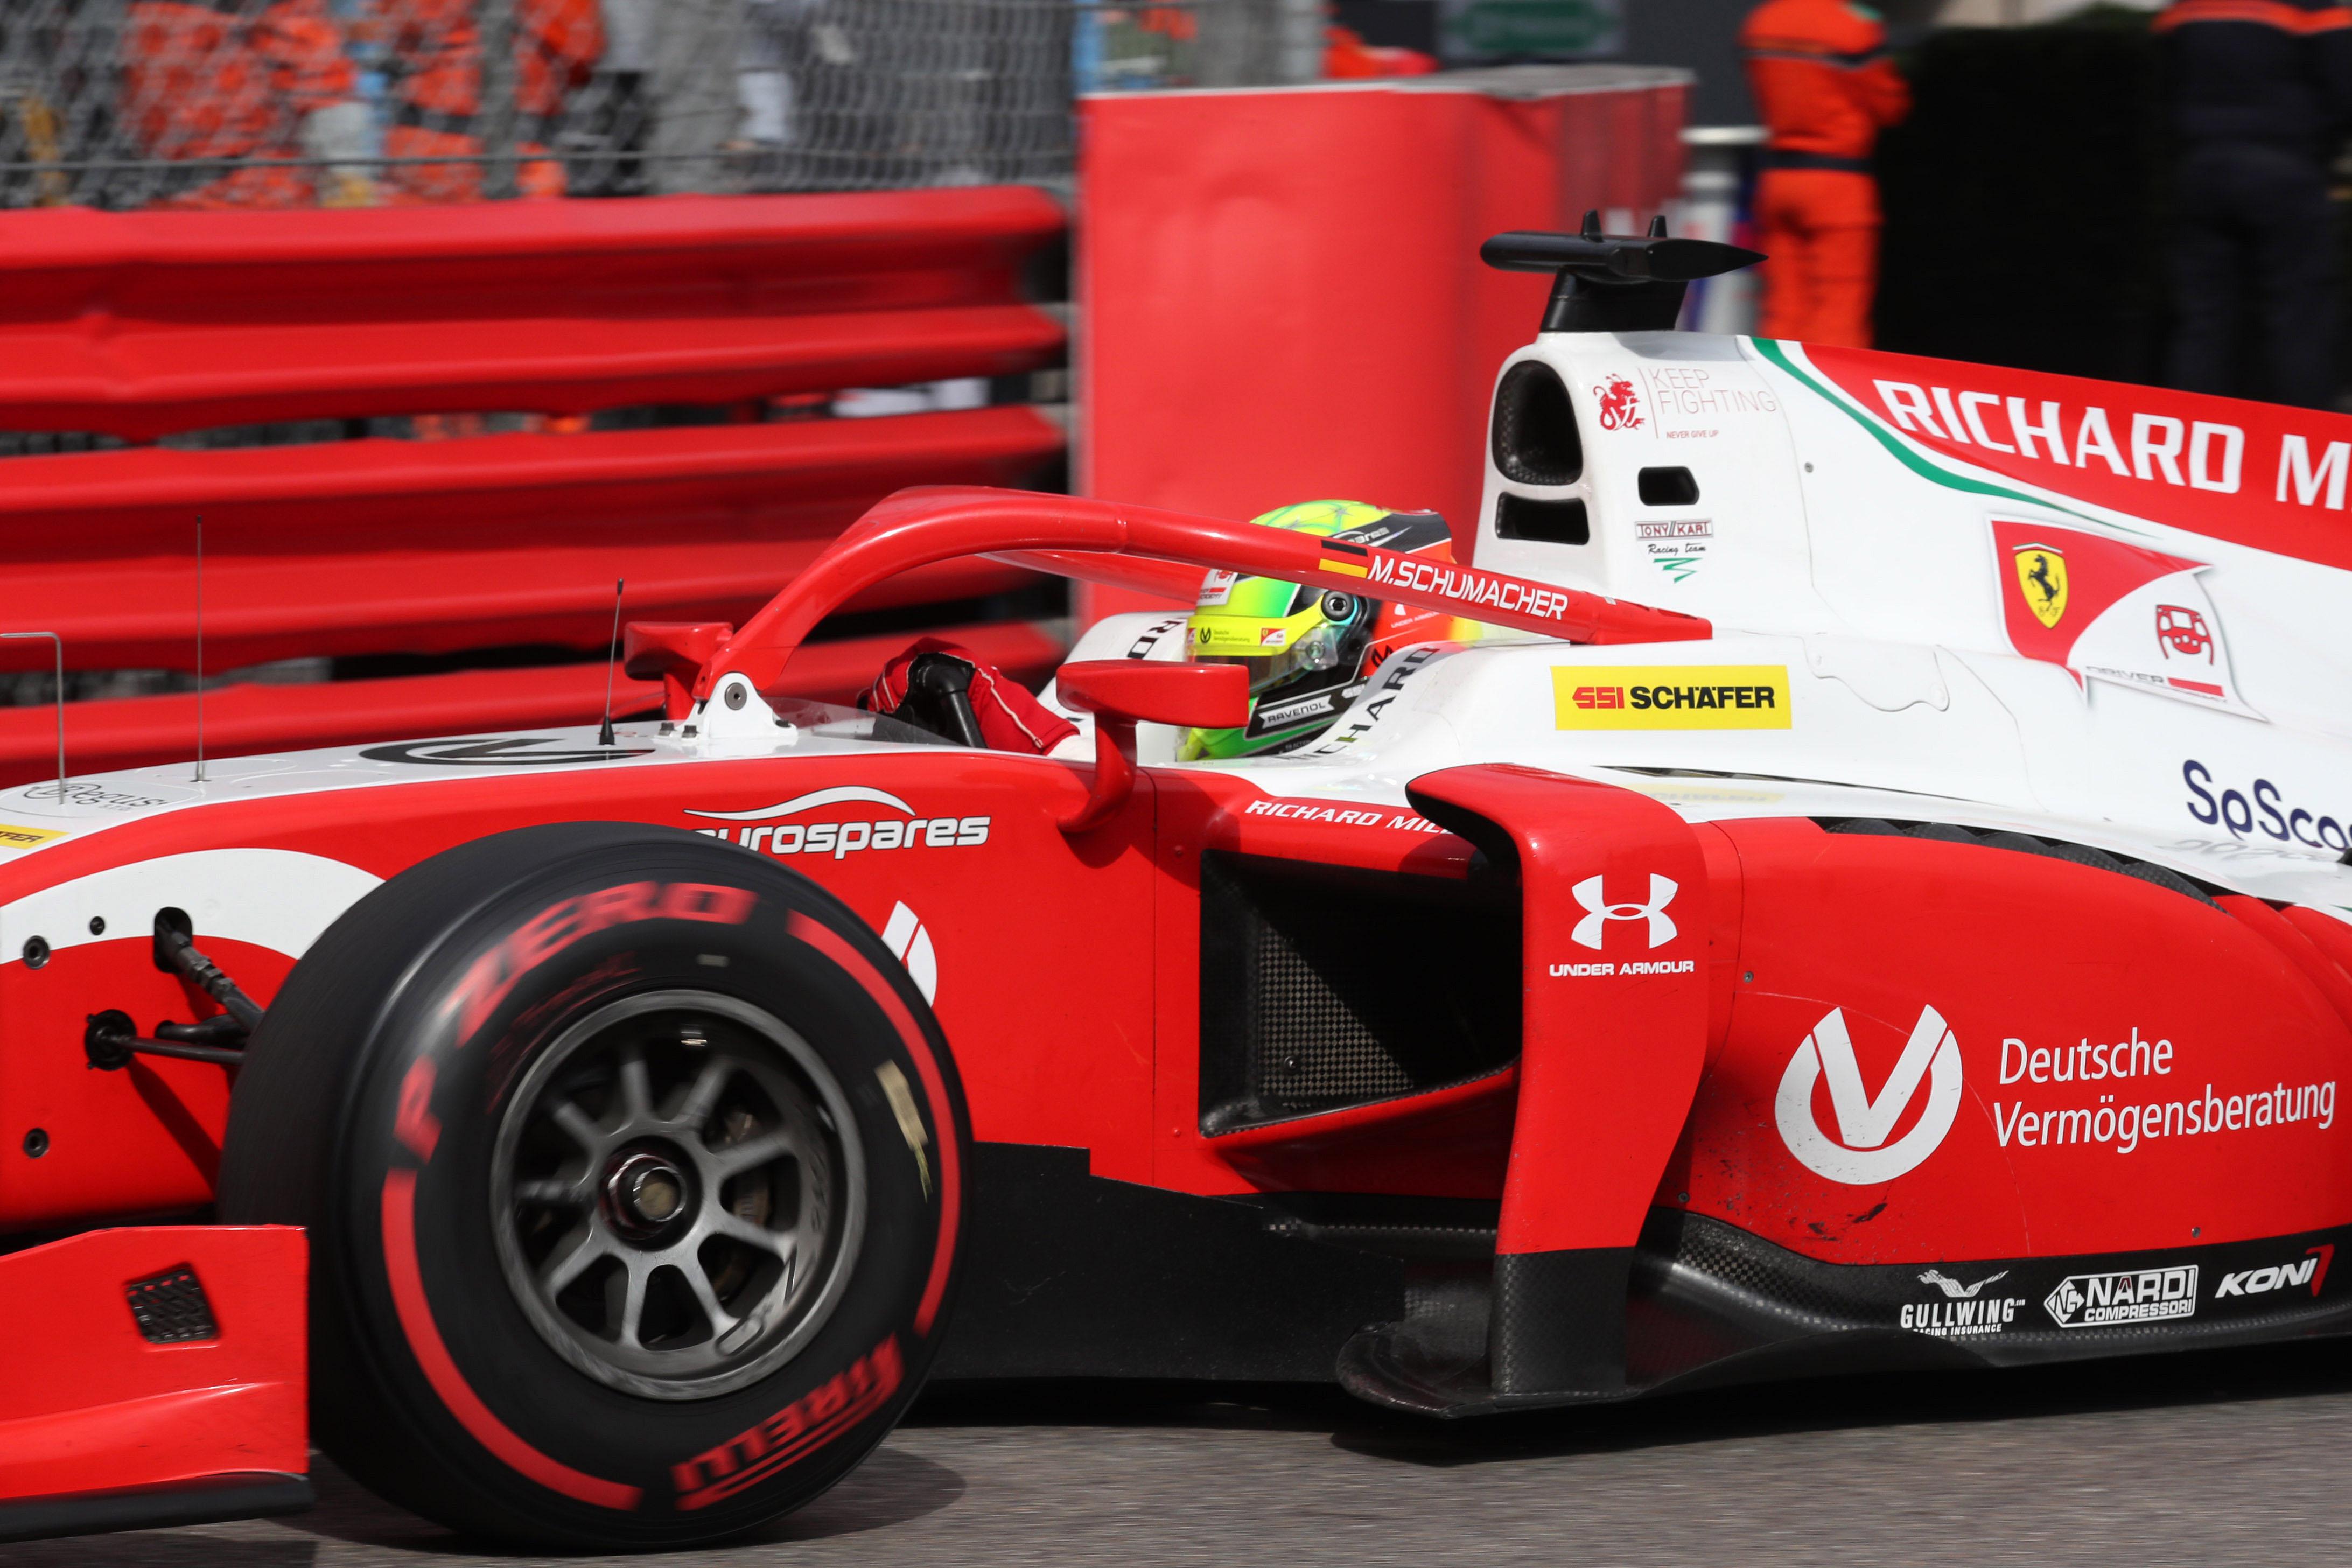 Motor Racing Fia Formula 2 Championship Thursday Monte Carlo, Monaco